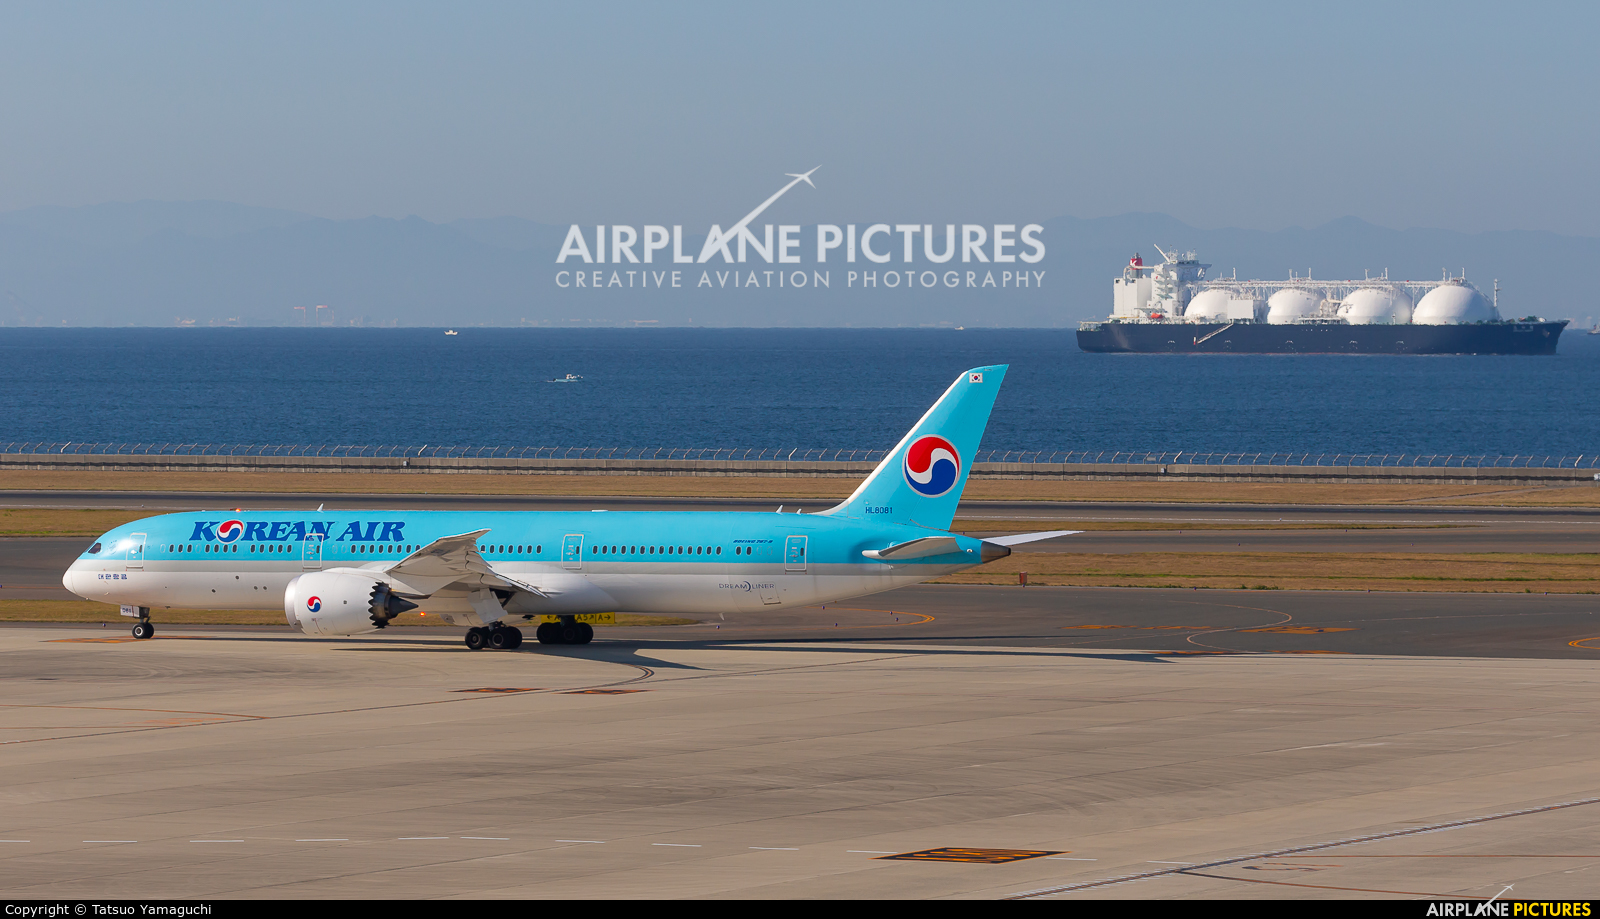 Korean Air HL8081 aircraft at Chubu Centrair Intl